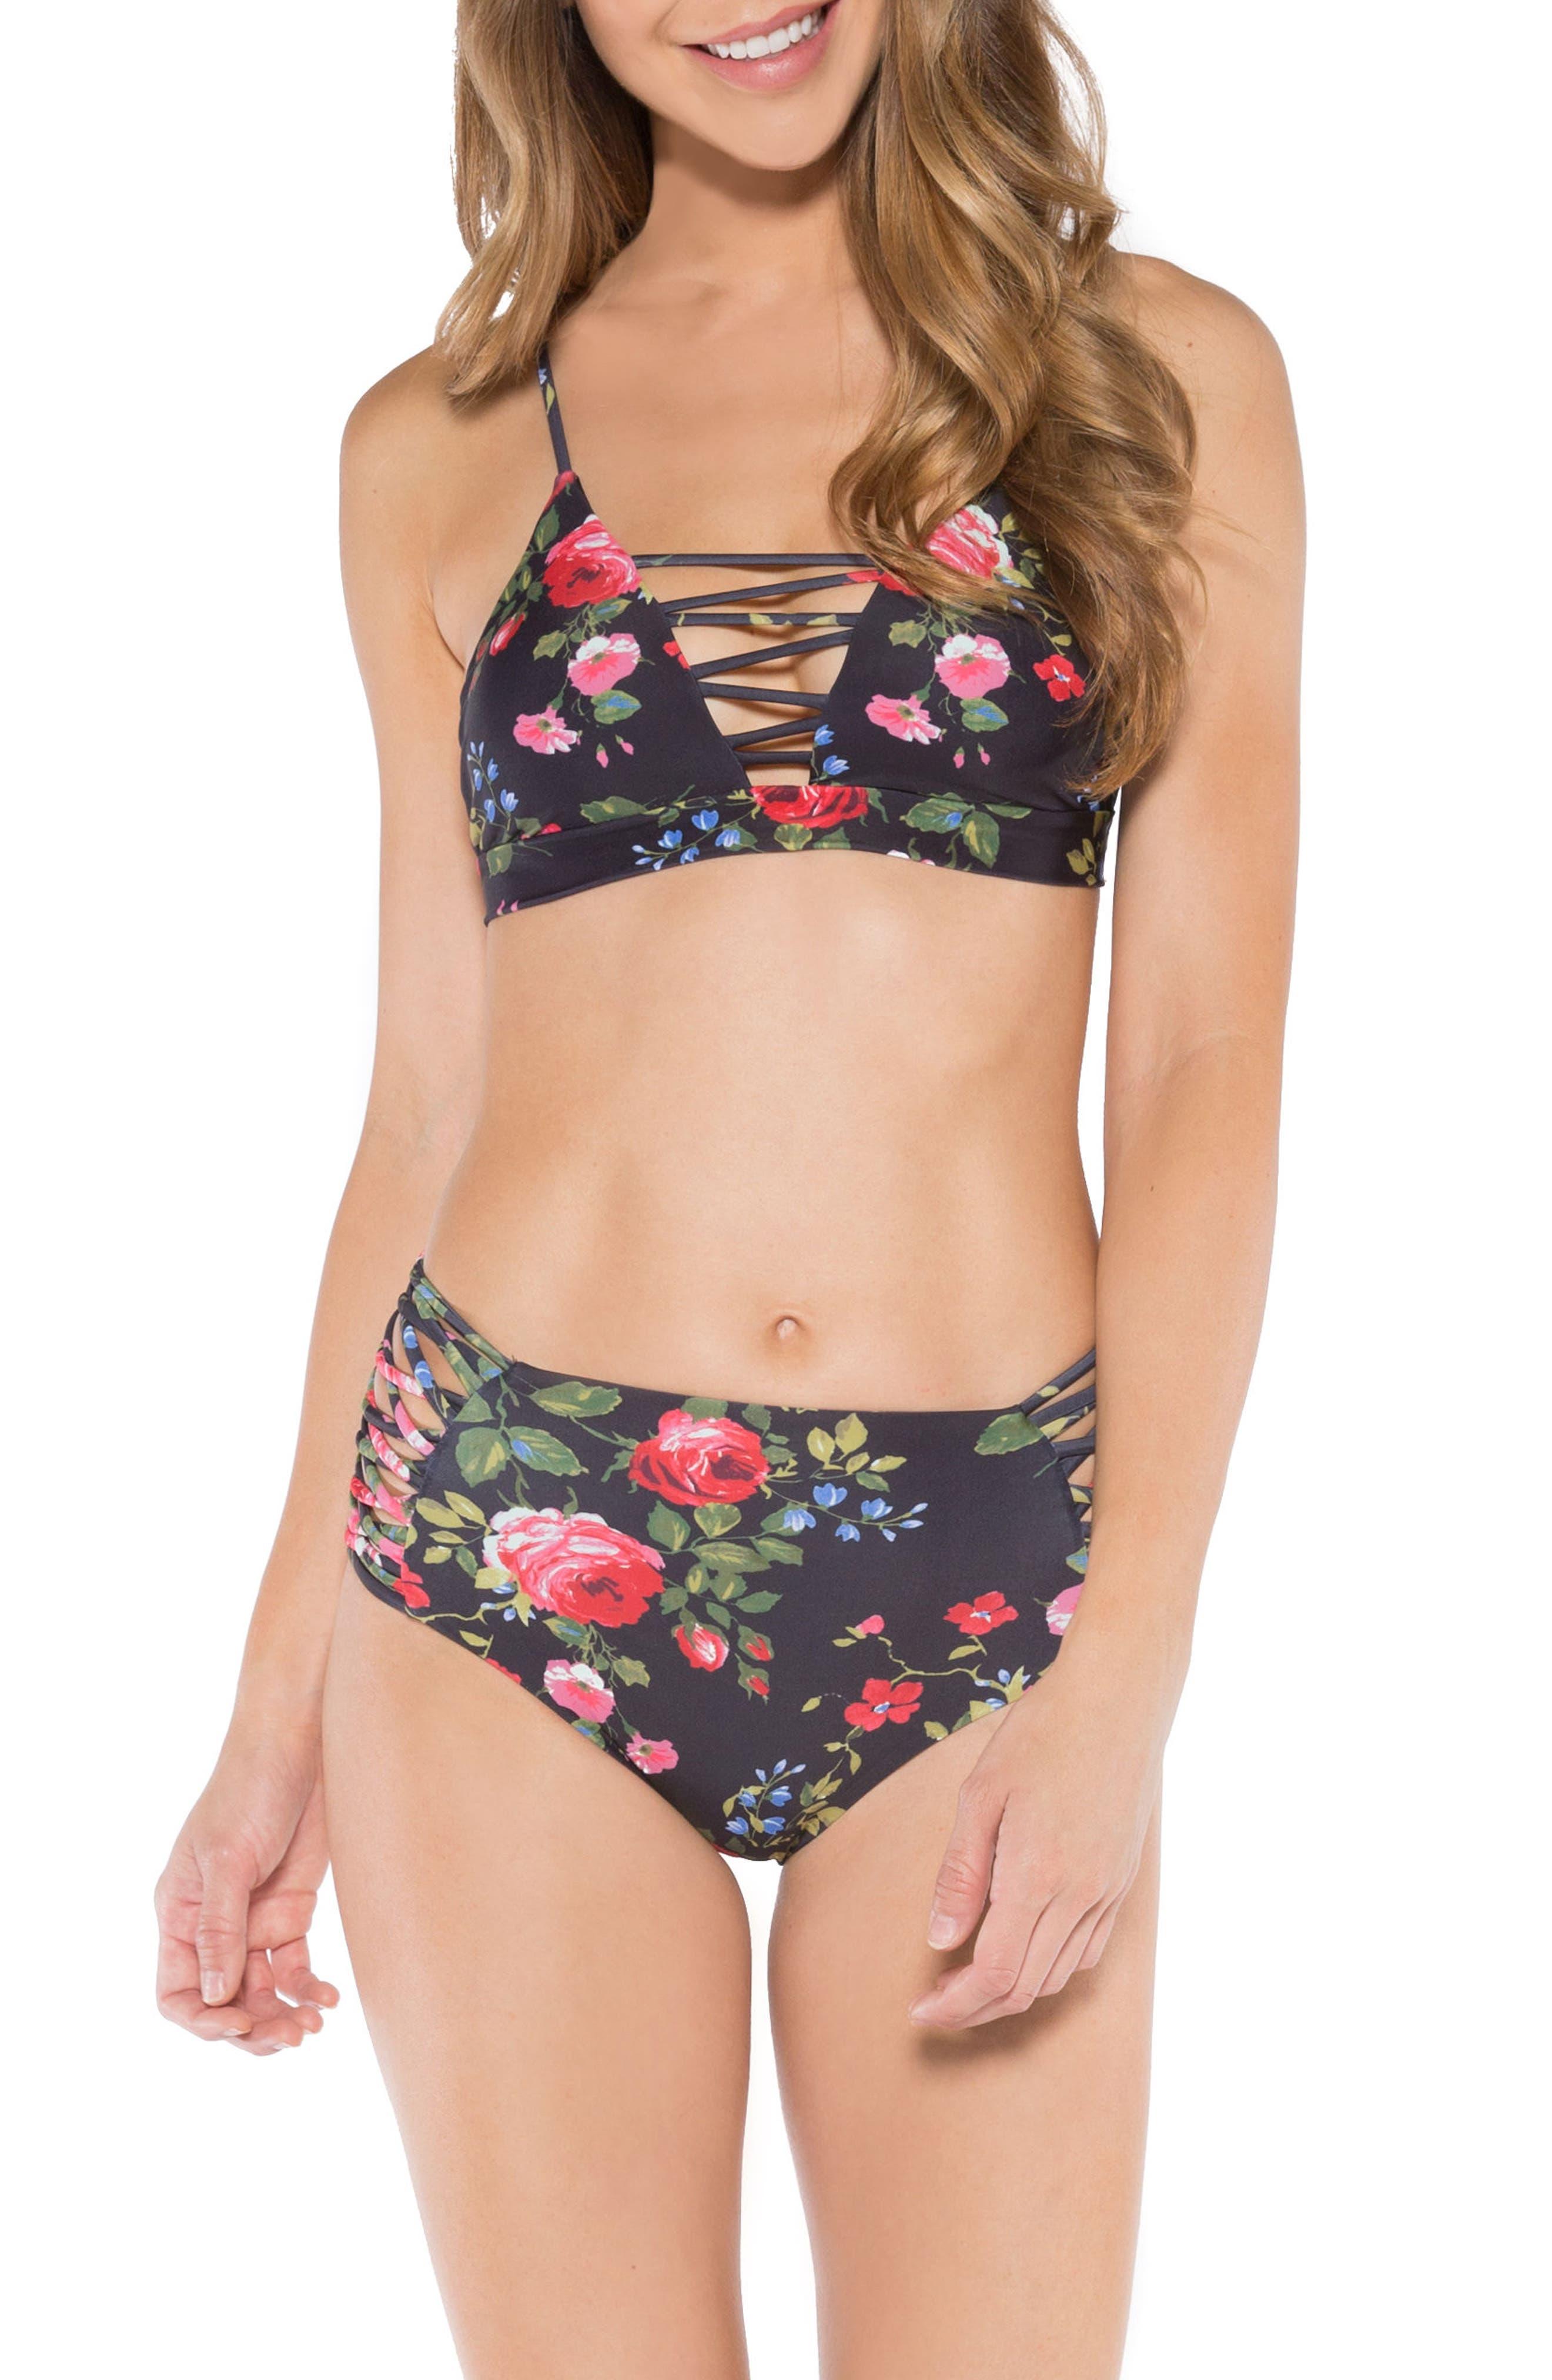 Solana Strappy High Waist Bikini Bottoms,                             Alternate thumbnail 4, color,                             Vintage Floral